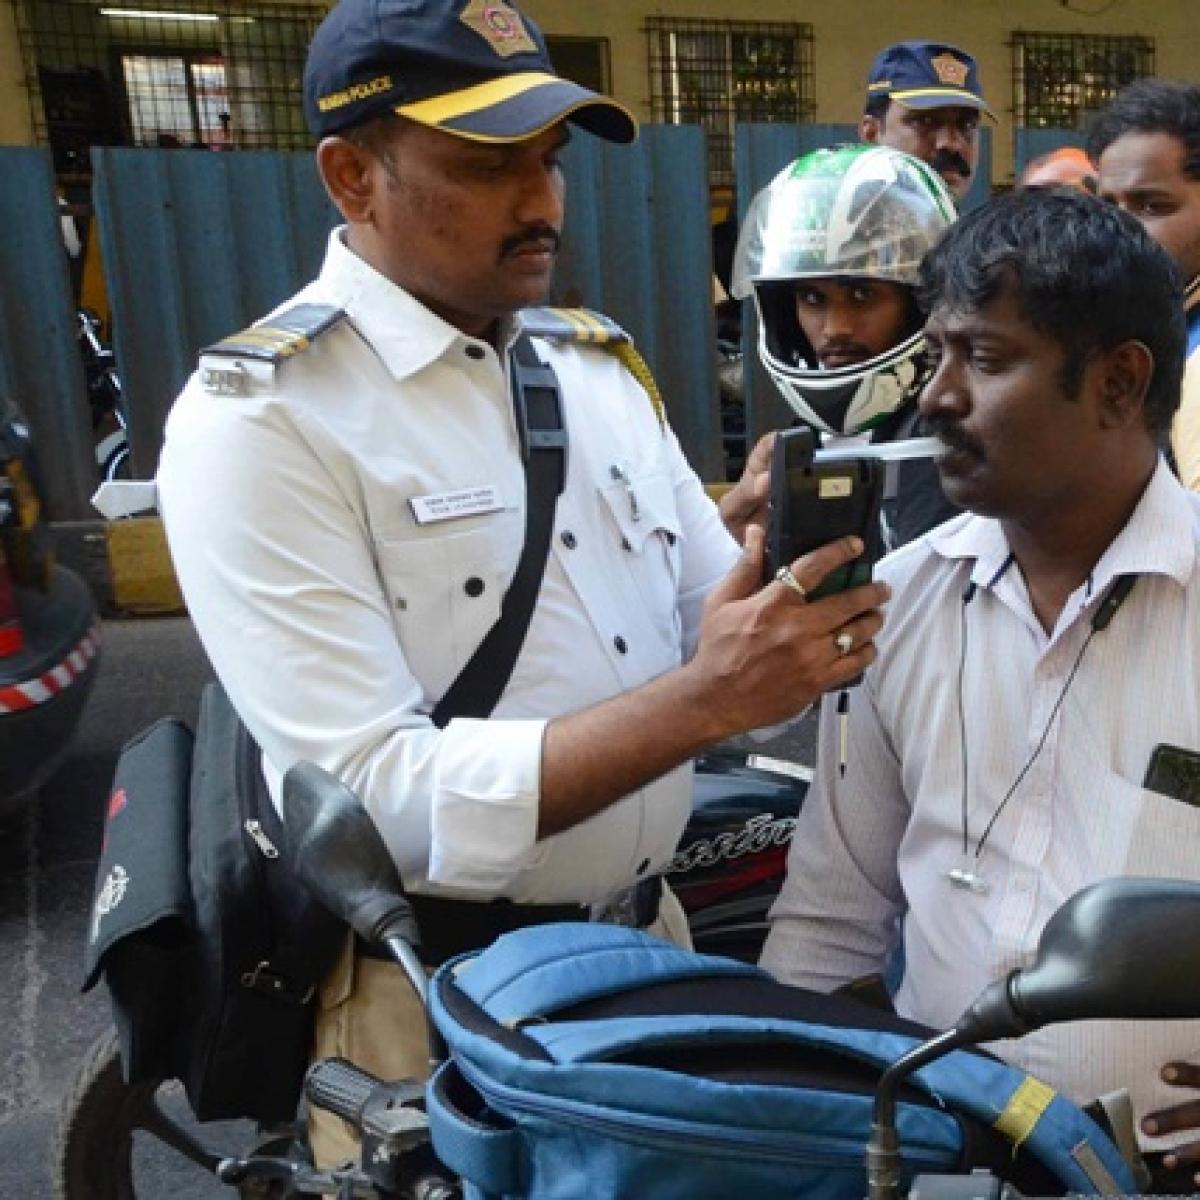 Coronavirus updates in Mumbai: Traffic cops to substitute breathanalyser checks with blood tests